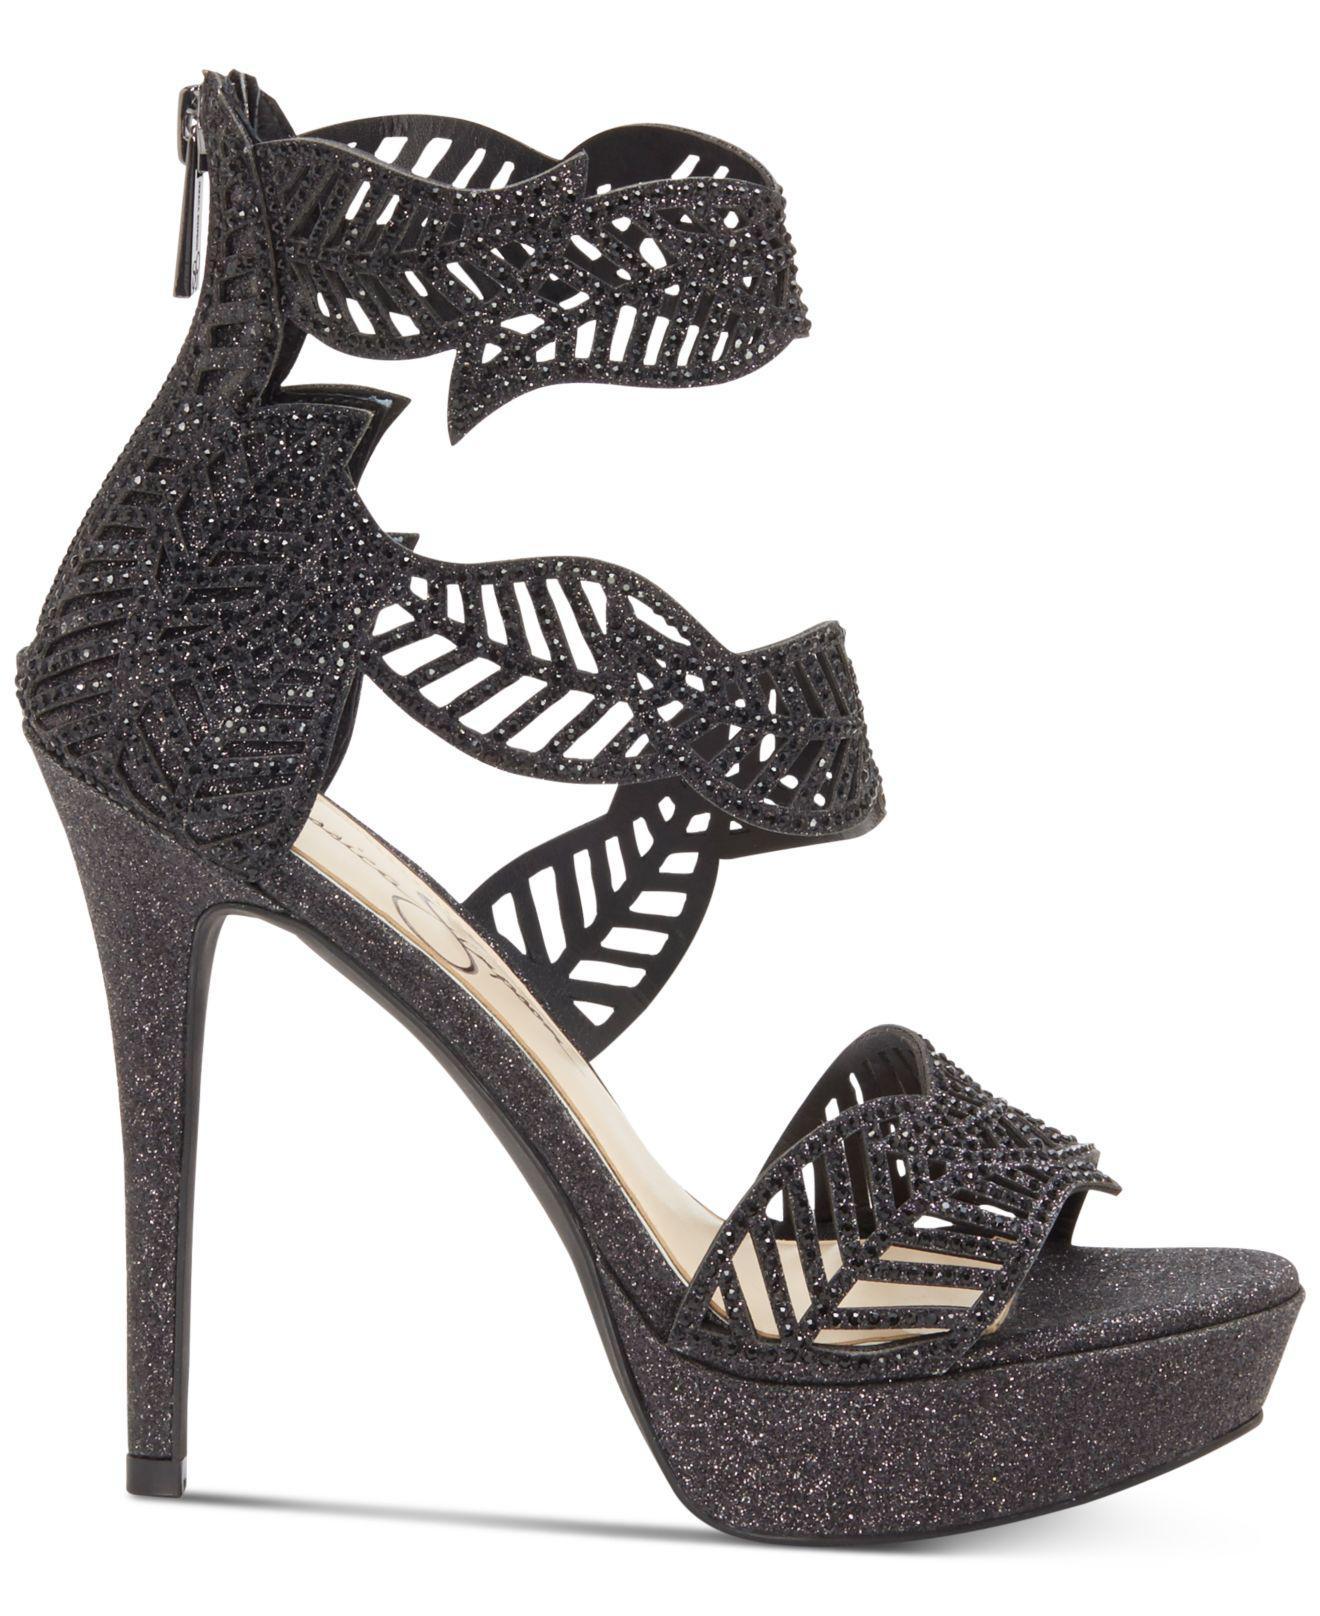 fe8a0025dd8d Lyst - Jessica Simpson Bonilynn Platform Dress Sandals in Black